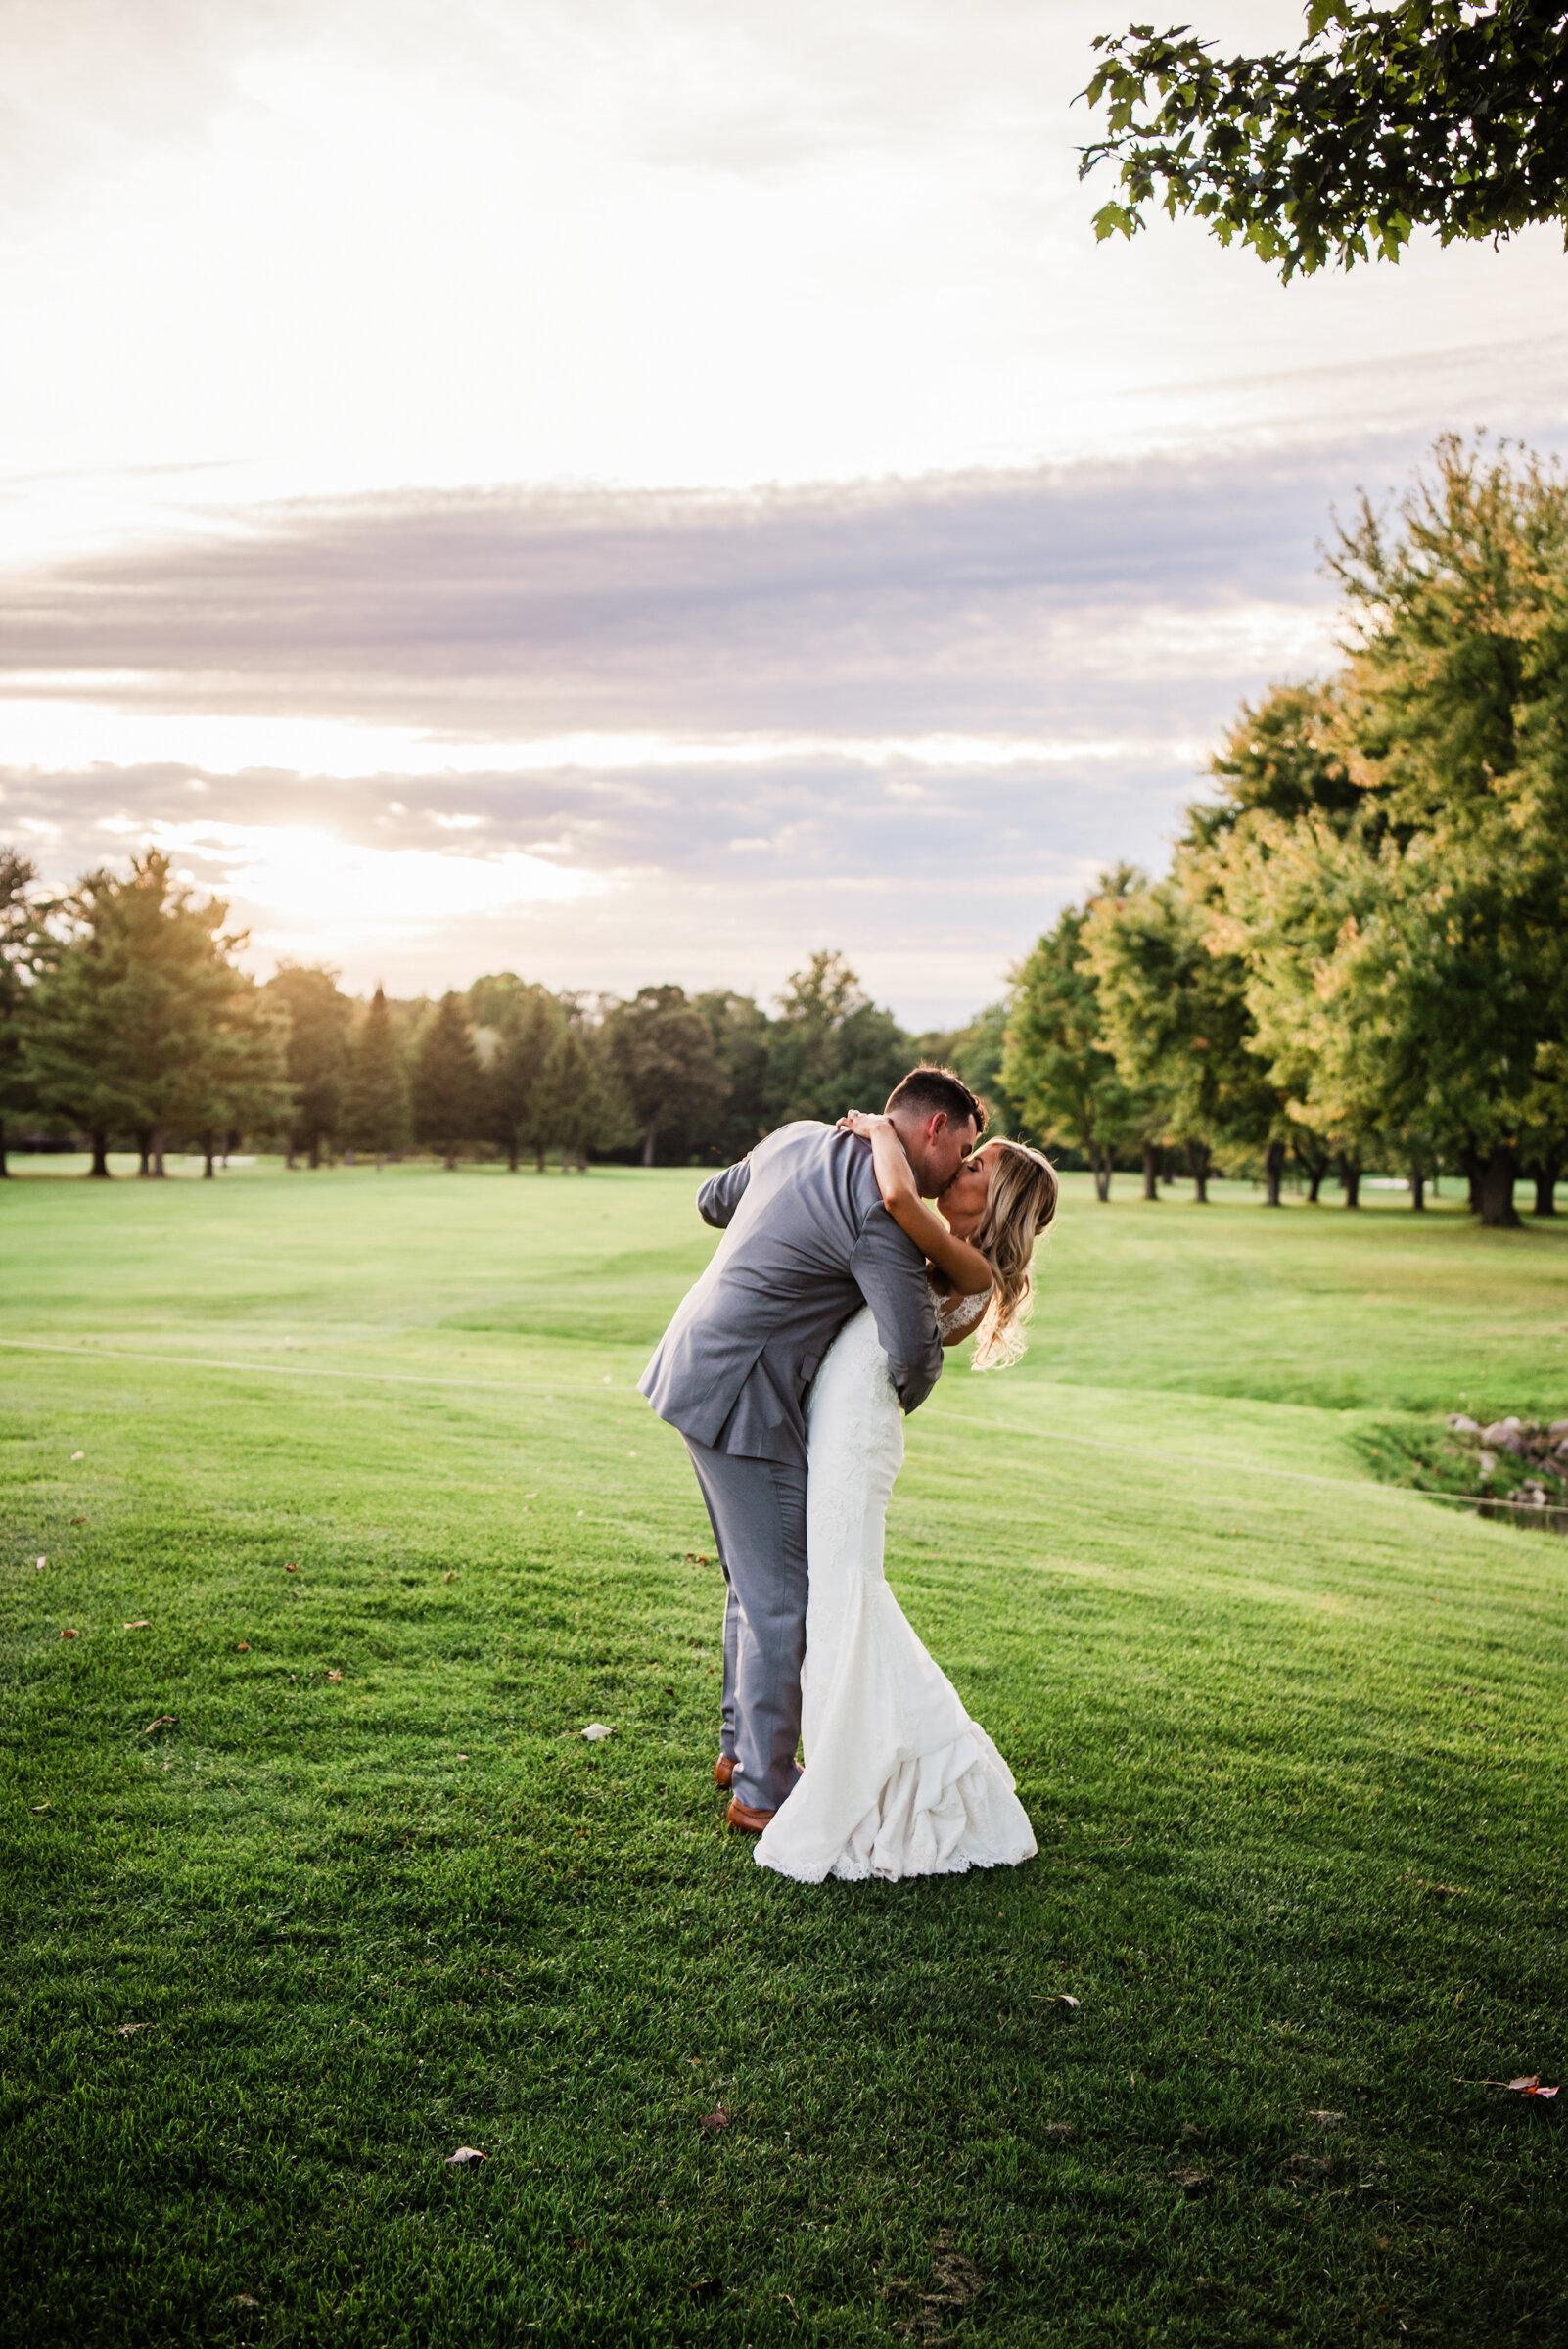 Deerfield_Country_Club_Rochester_Wedding_JILL_STUDIO_Rochester_NY_Photographer_DSC_6972.jpg